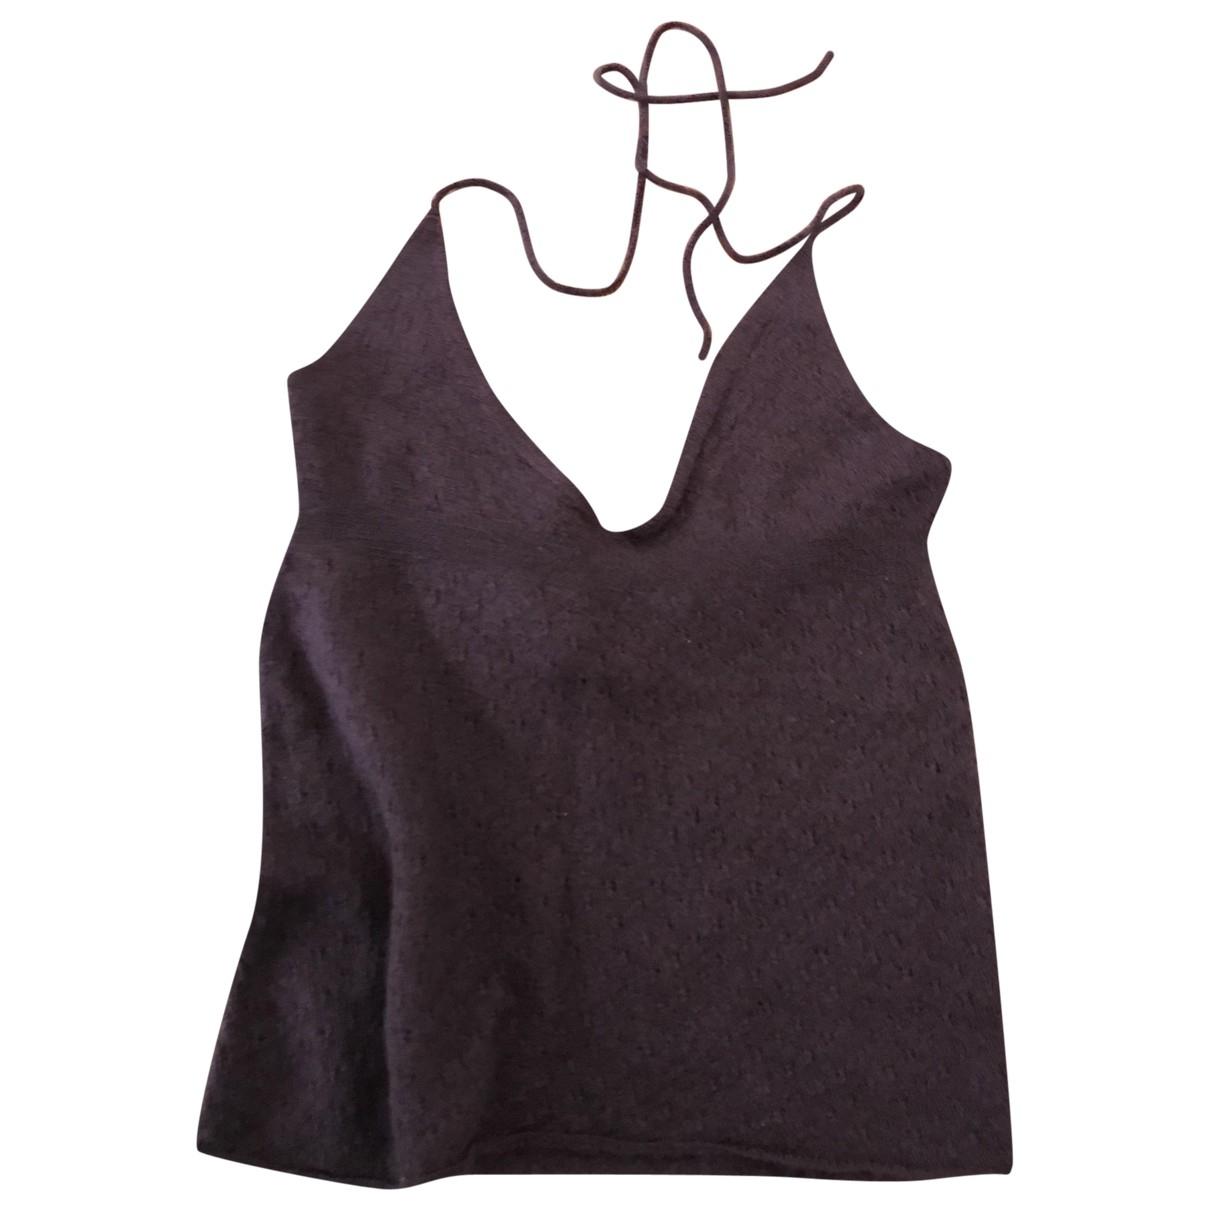 Louis Vuitton \N Burgundy Cashmere  top for Women 34 FR